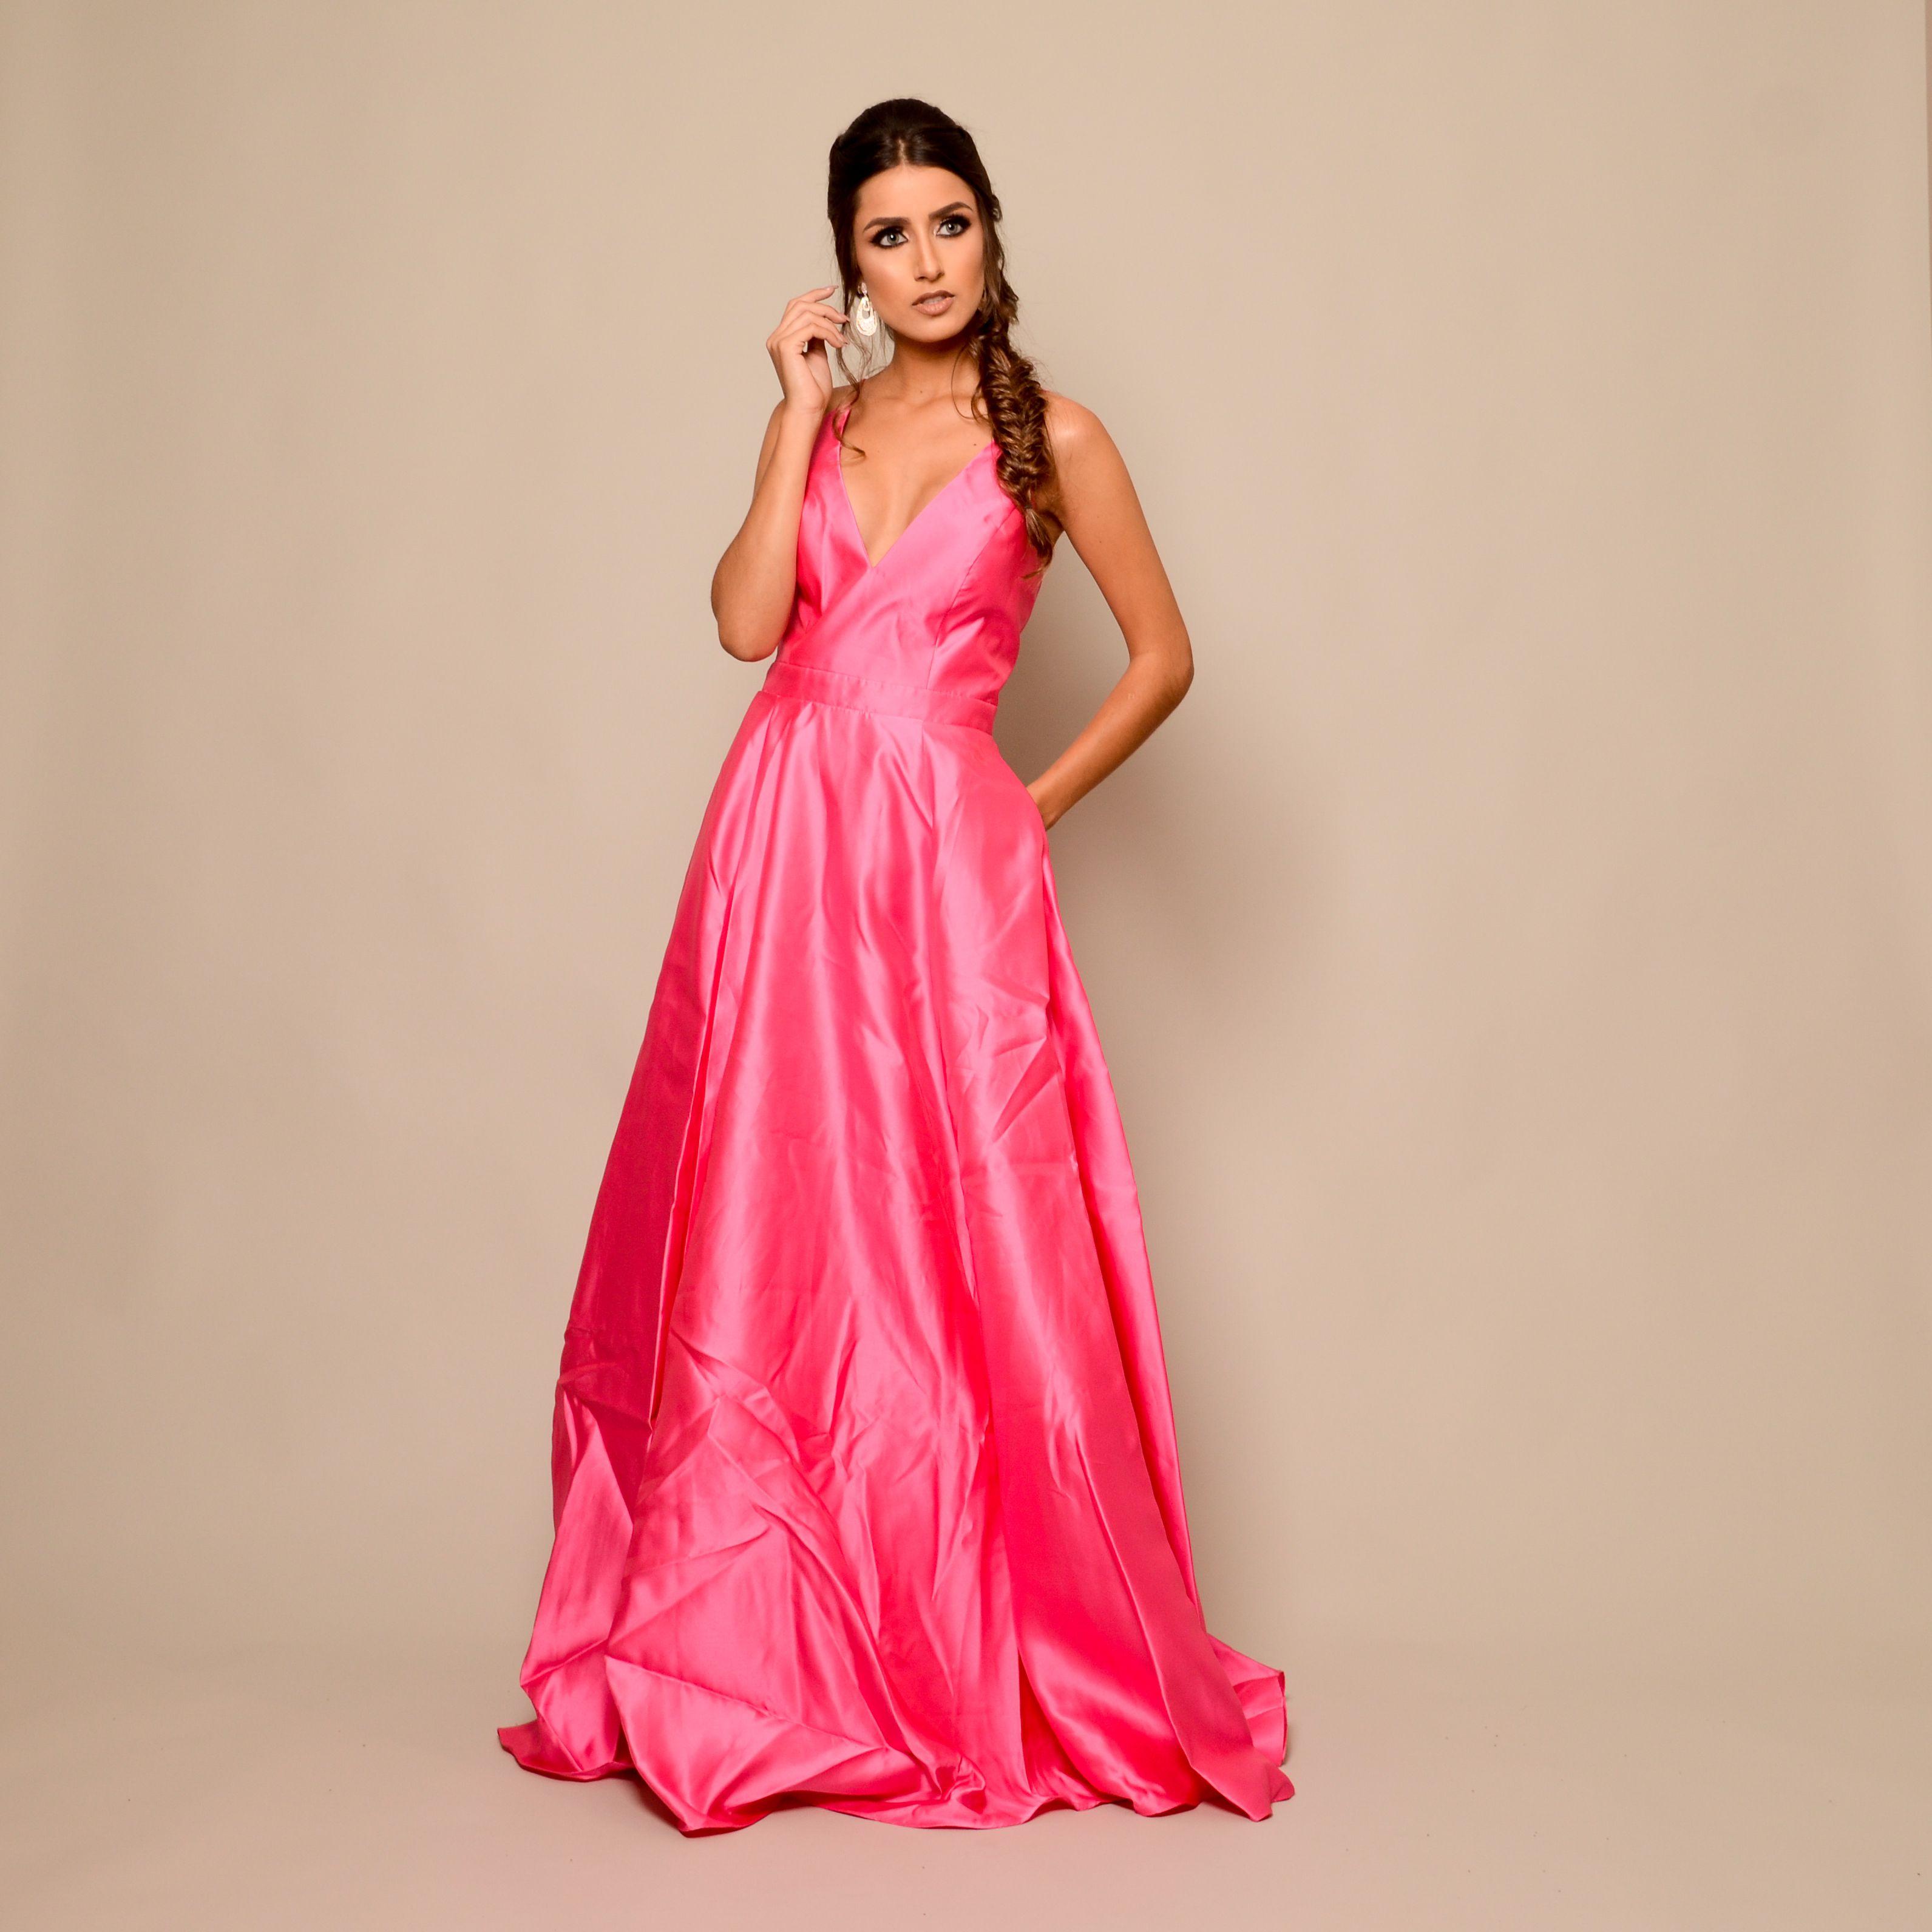 Vestido De Festa Rosa Jovani Disponivel Para Aluguel Em Belo